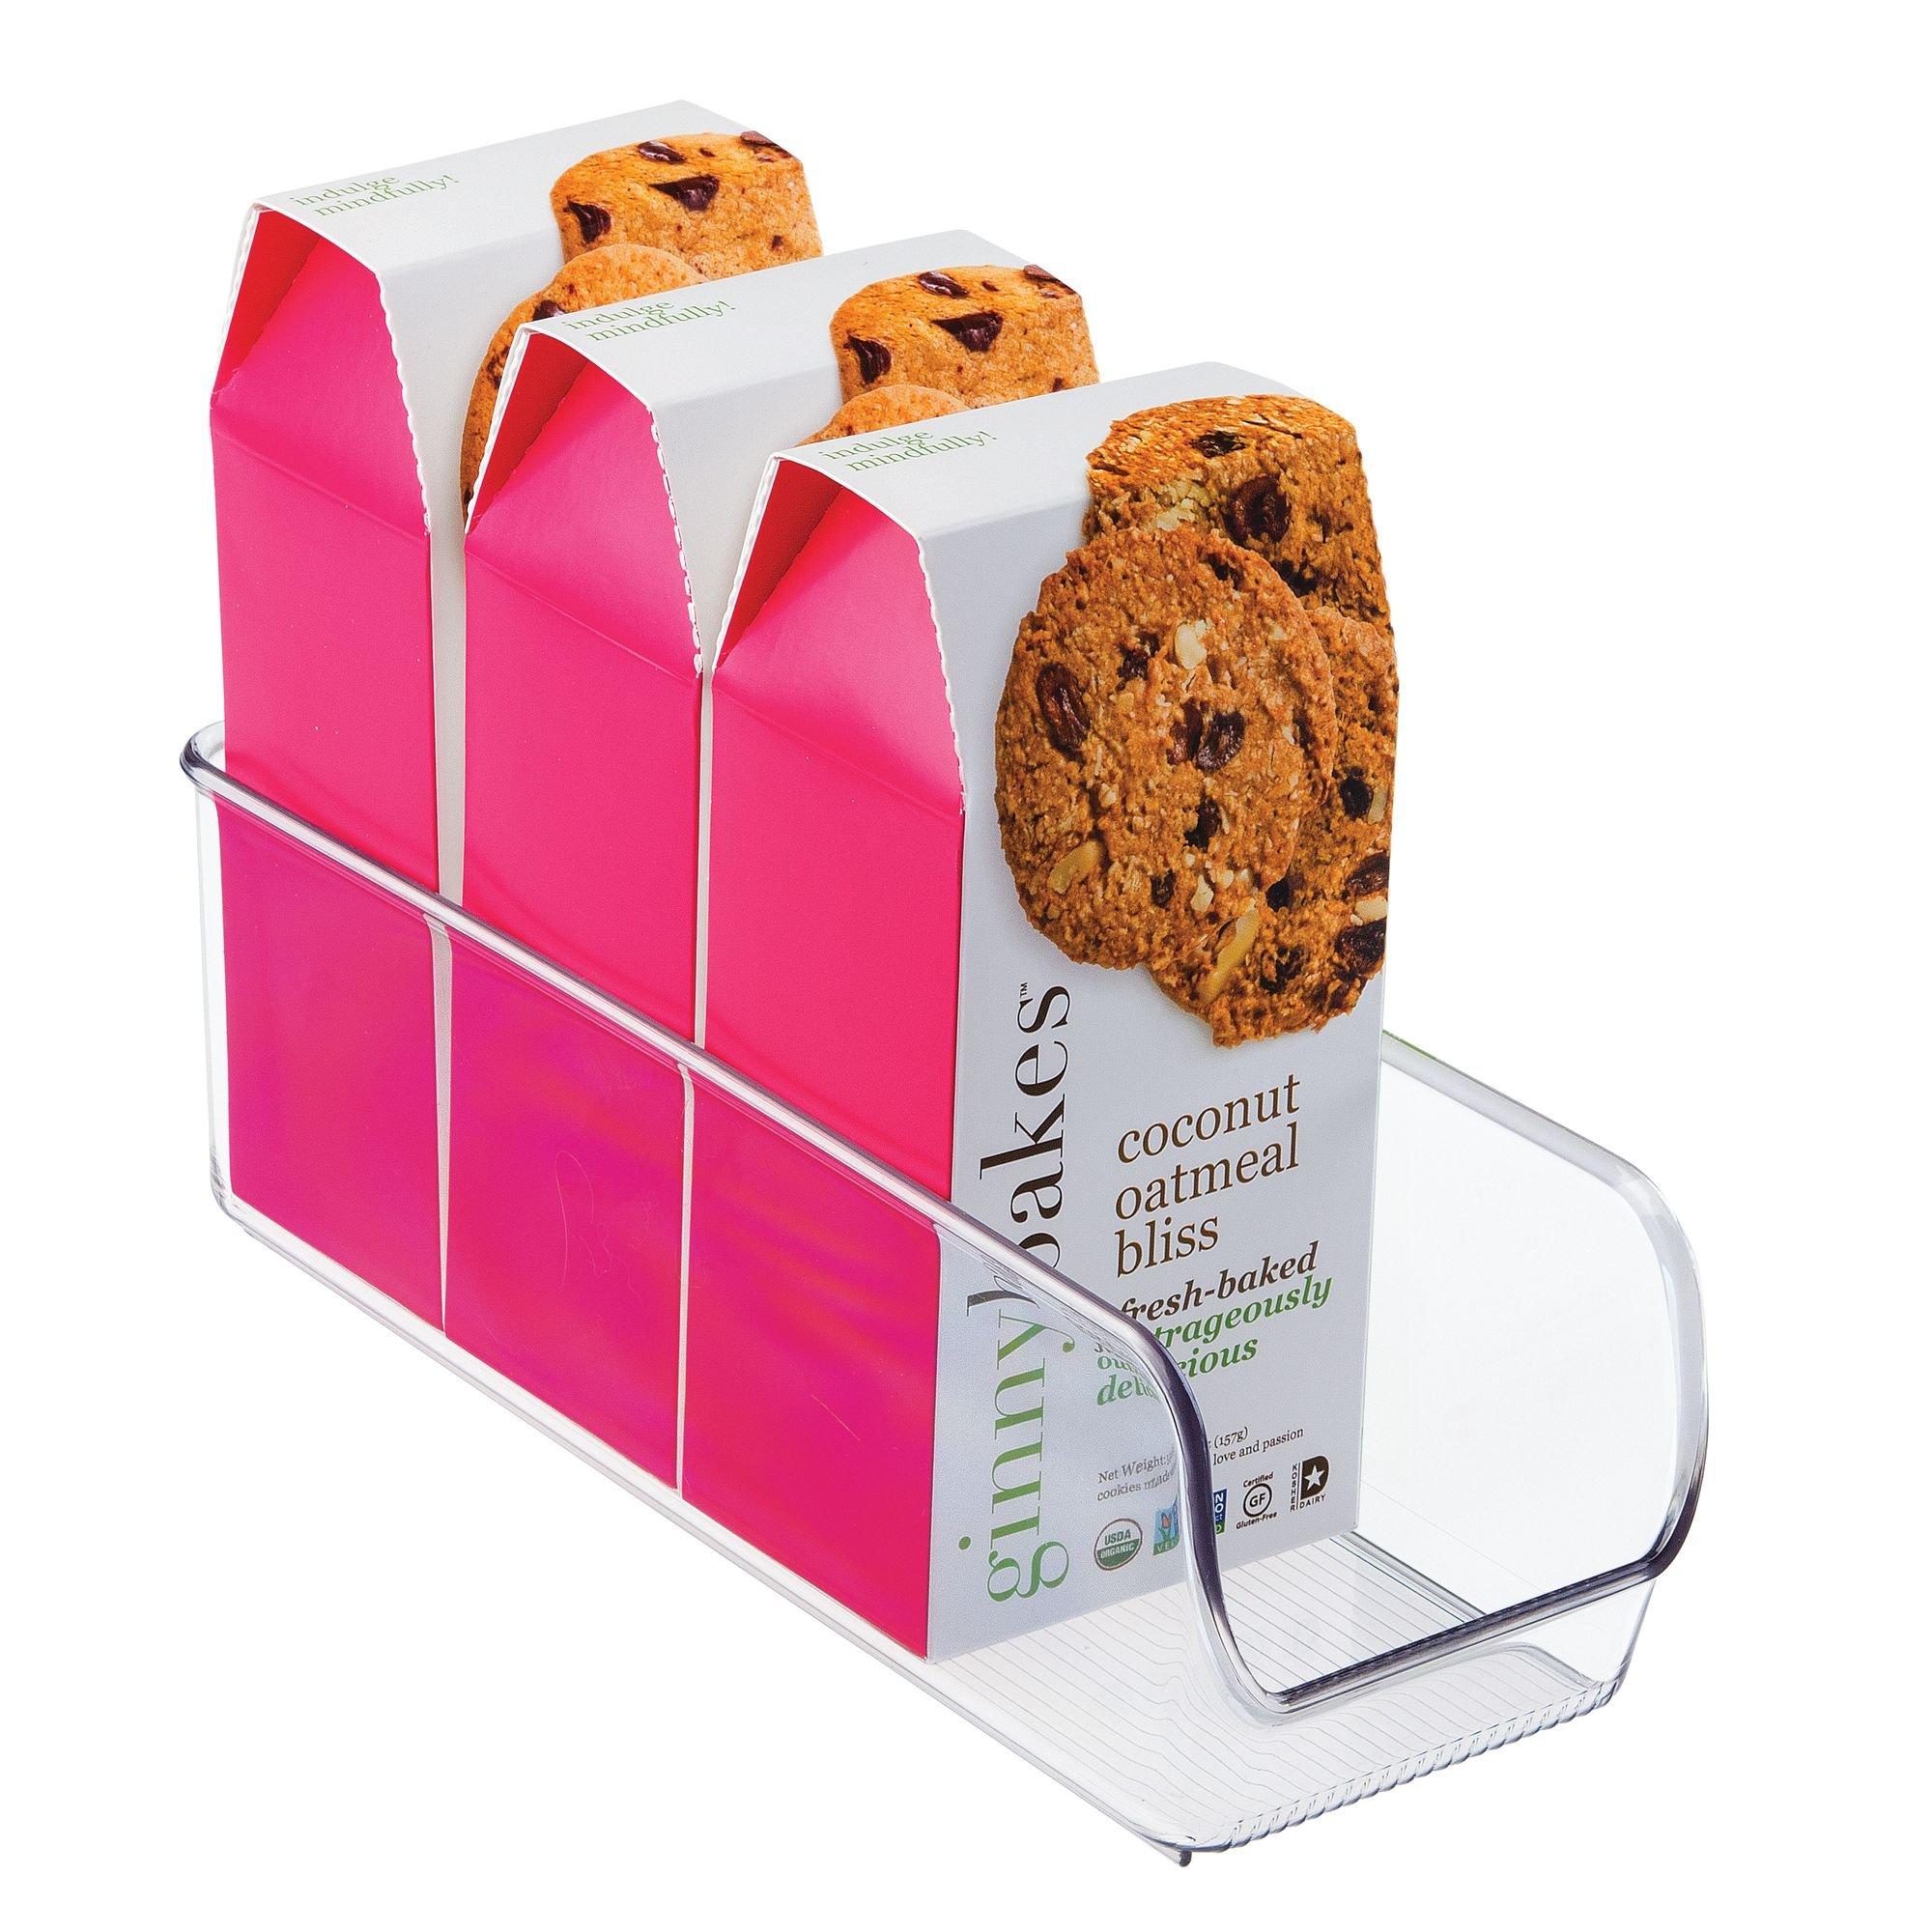 InterDesign Linus Organizador para la cocina, caja organizadora de plástico antirrotura de tamaño pequeño,